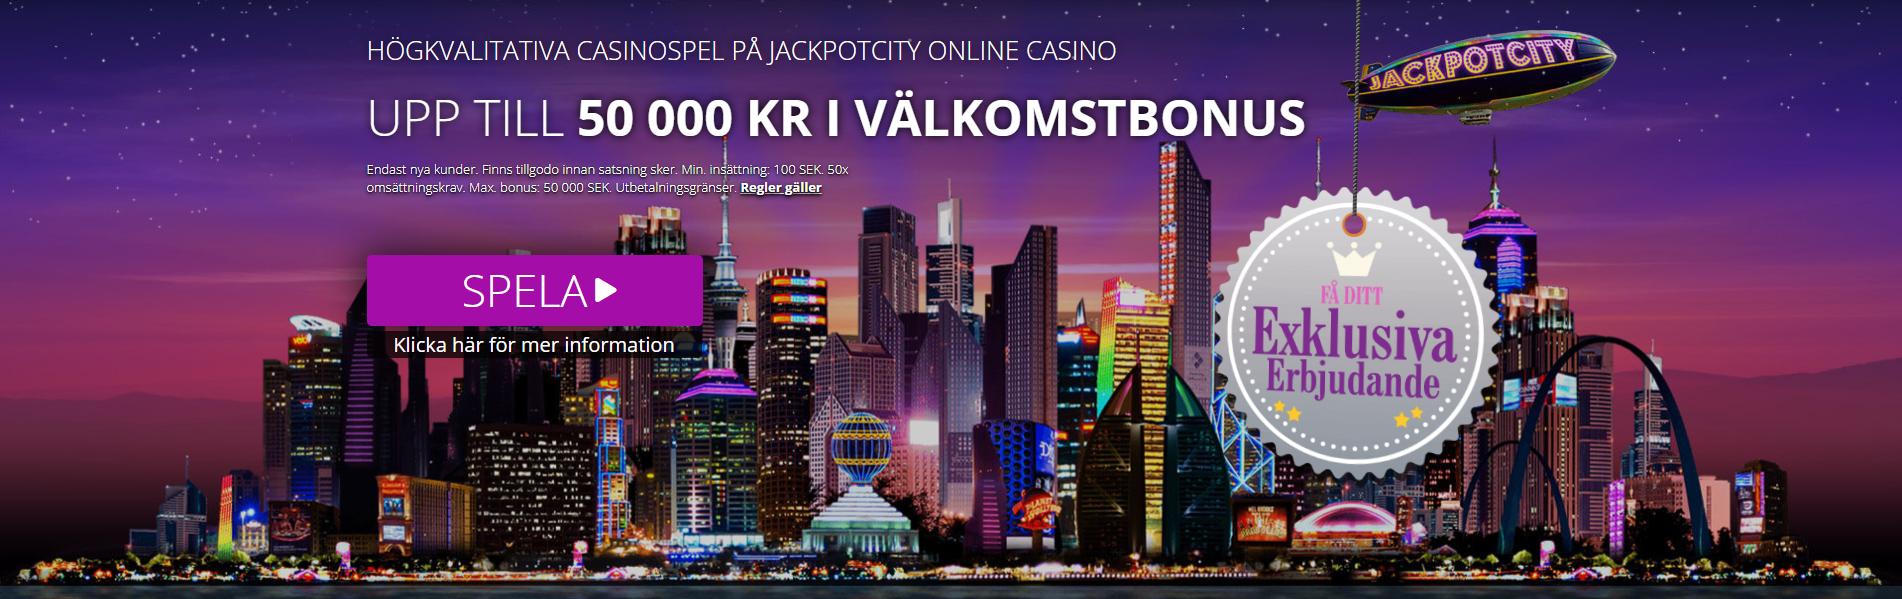 JackpotCity Casino Content Images - Sweden CasinoTop